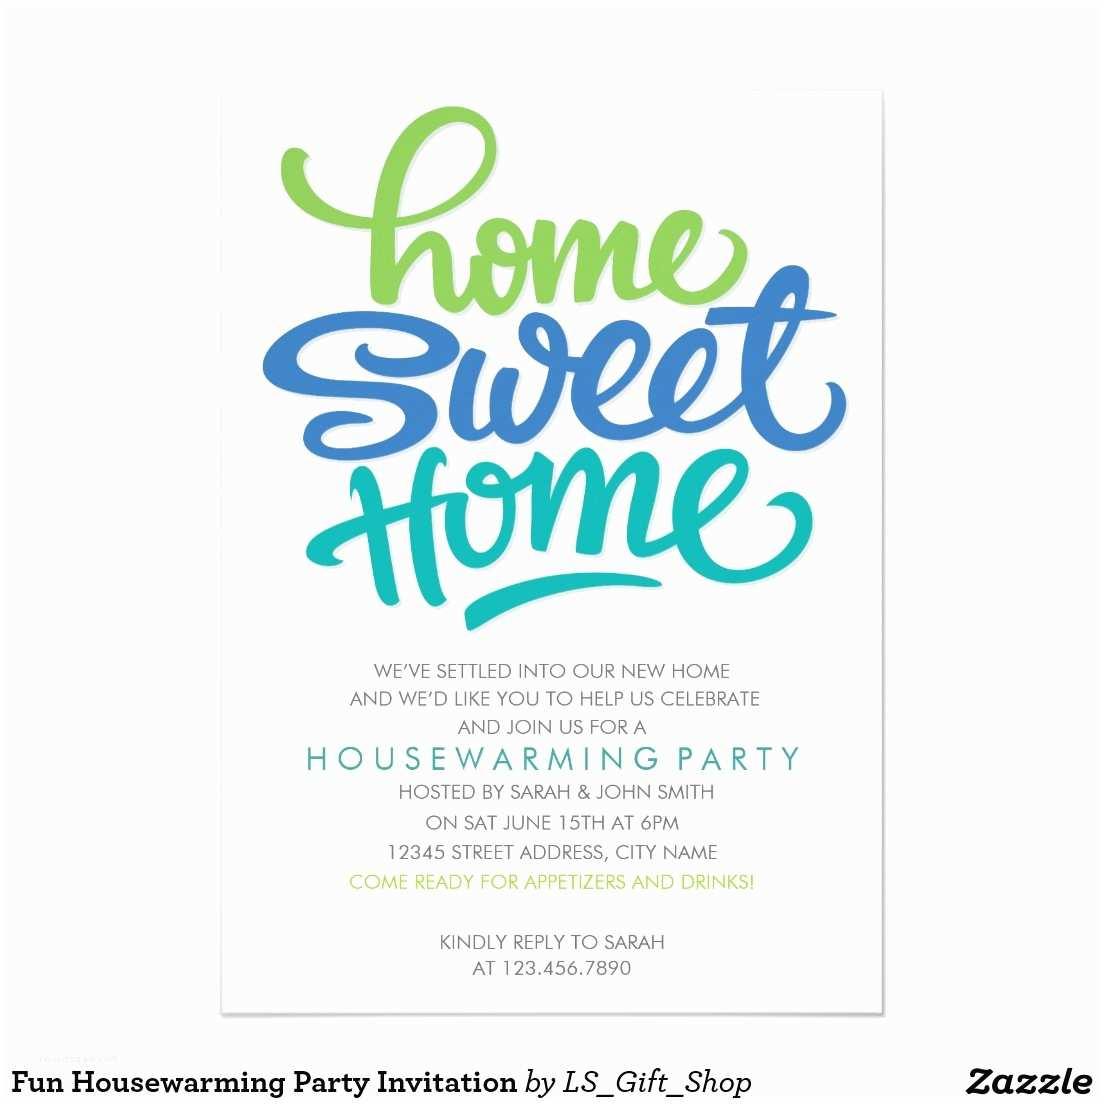 /housewarming/housewarming Invitation Wording House Warming Party Invitations – Gangcraft